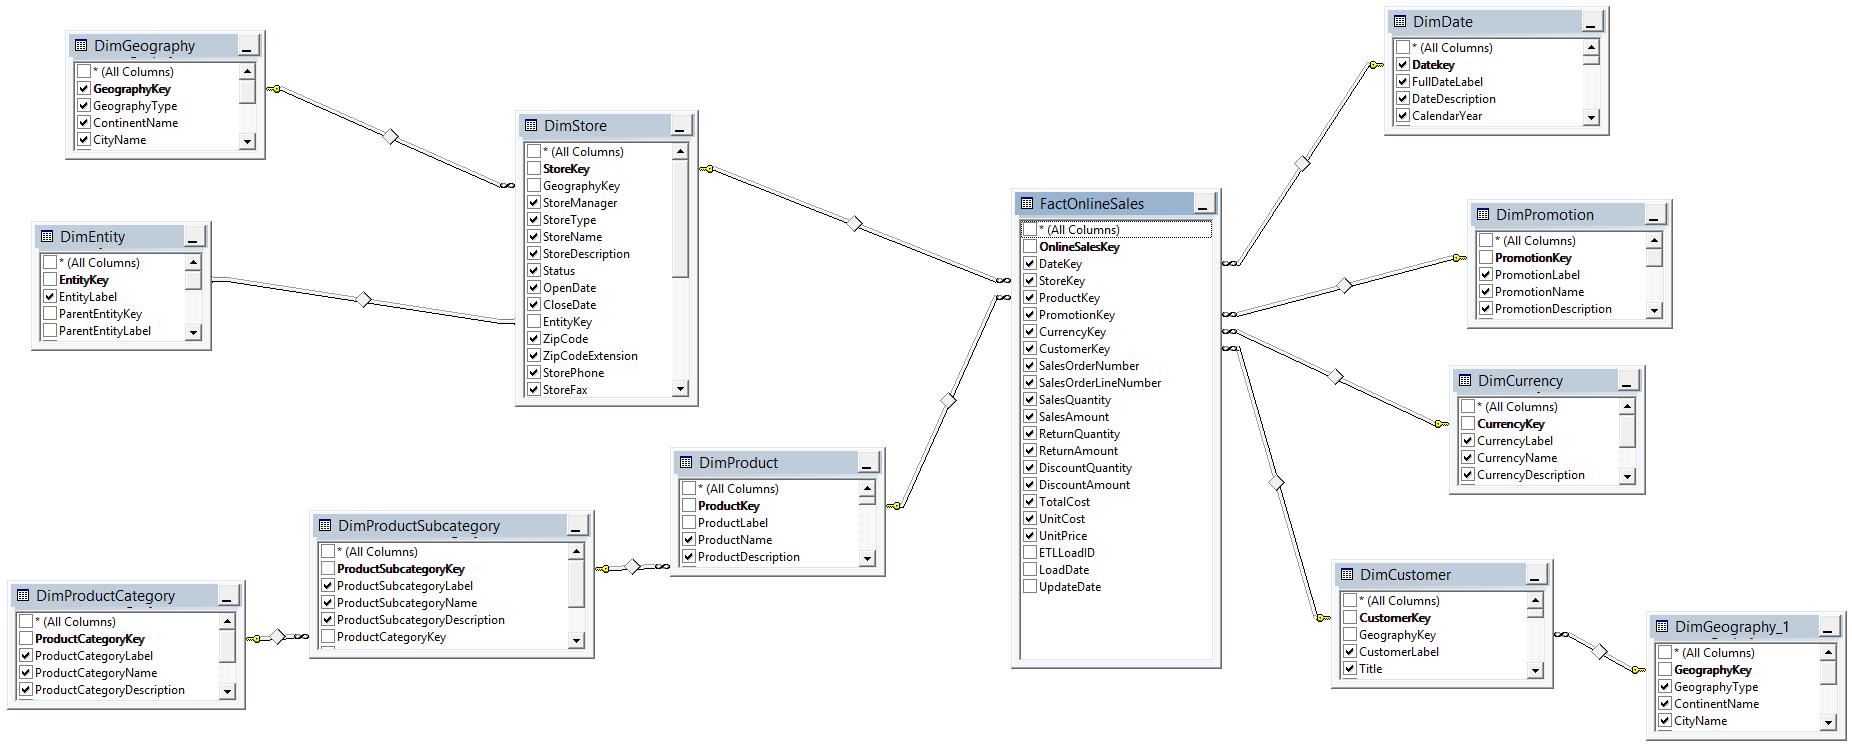 Extreme 25x Compression Of Json Data Using Clustered Columnstore Indexes Sql Server Relational Database Management System Database Management System